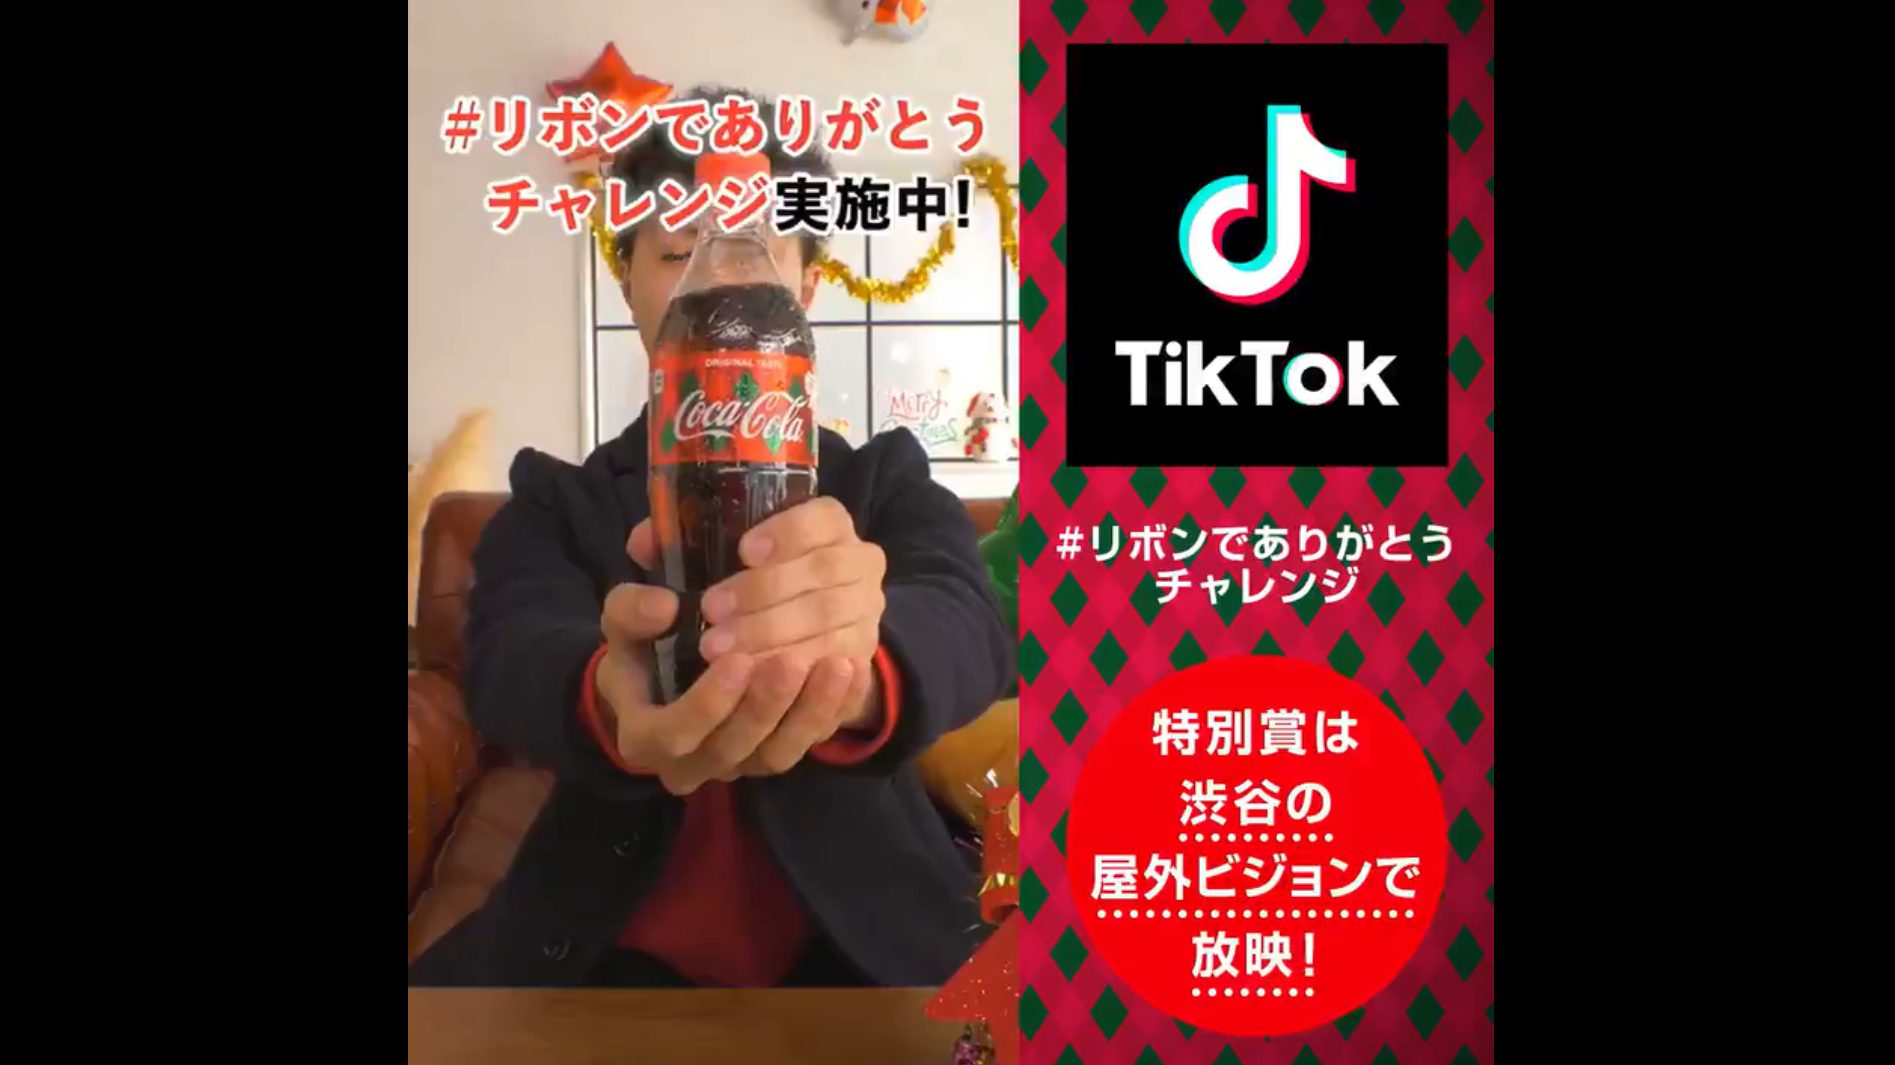 tiktok-campaign-cocacola-japan